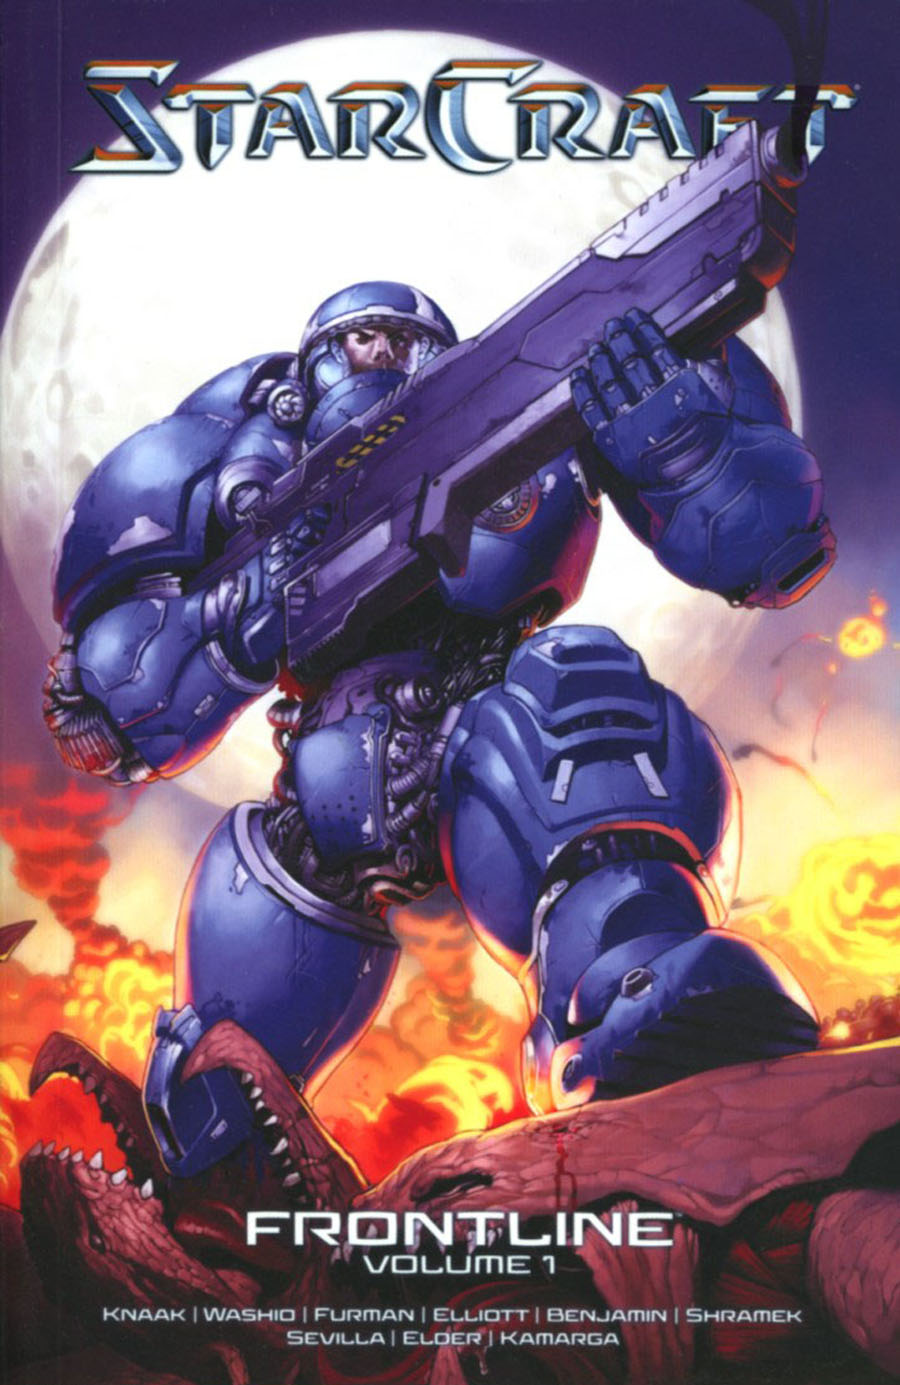 Starcraft Frontline Vol 1 TP Blizzard Edition